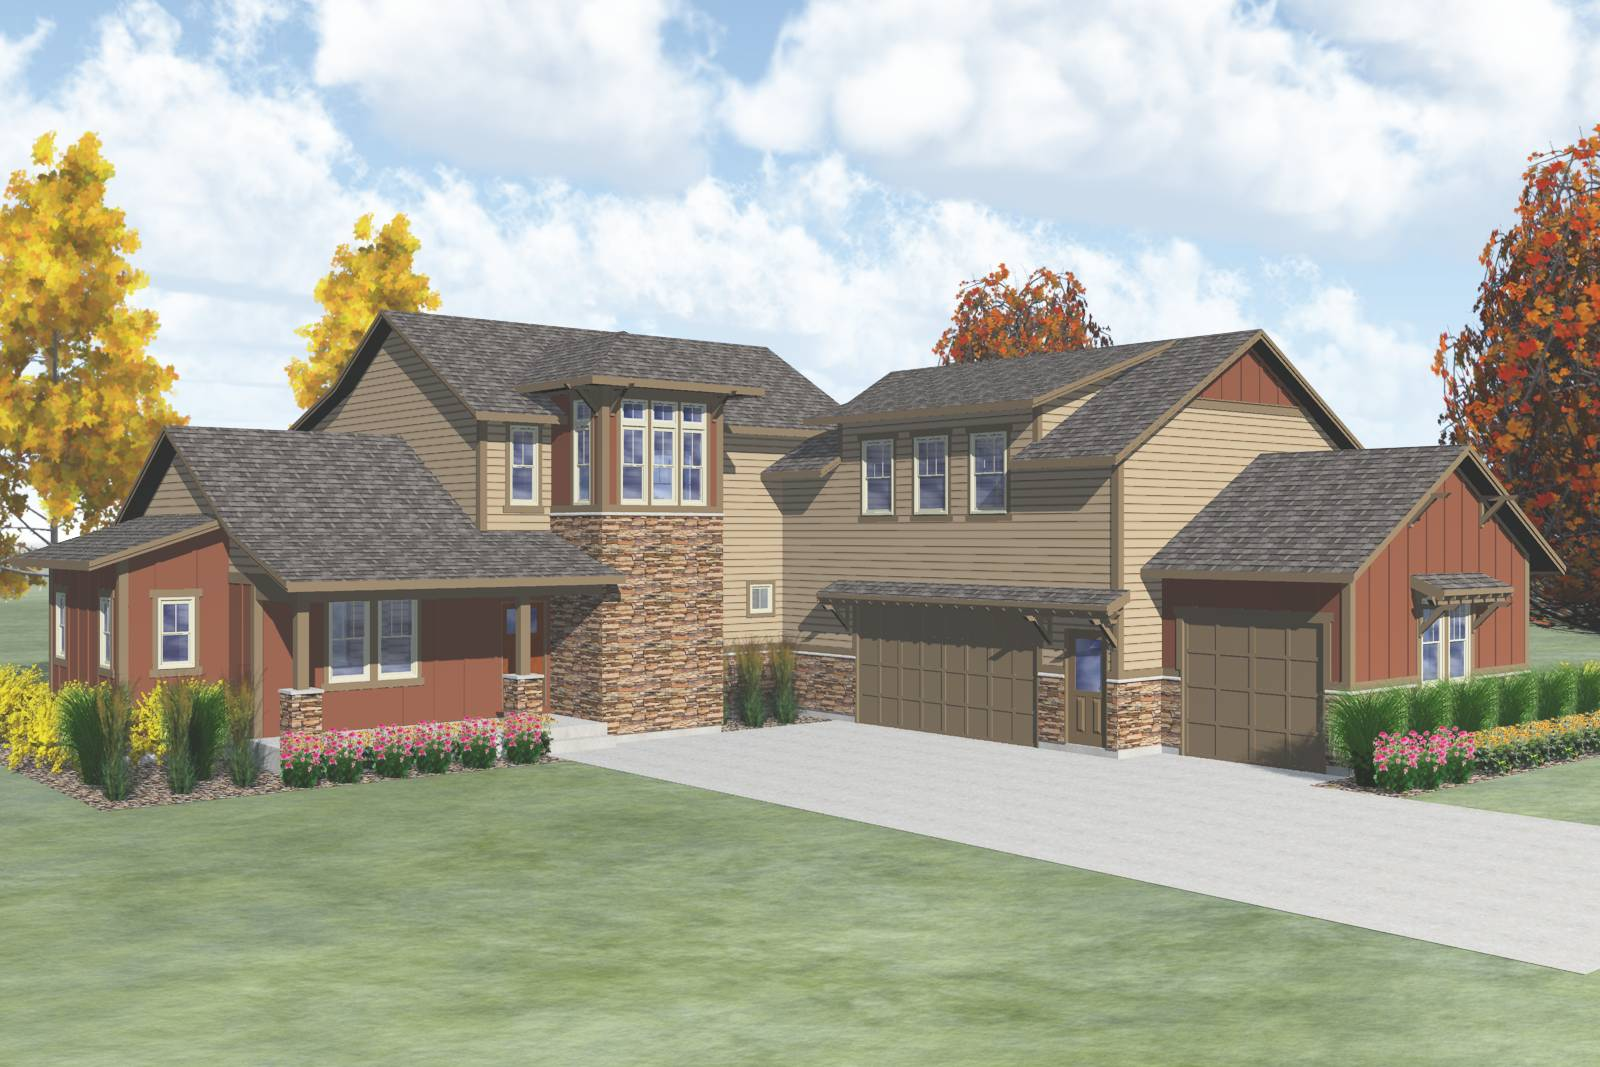 Linden gate bluestone homes for Bluestone homes